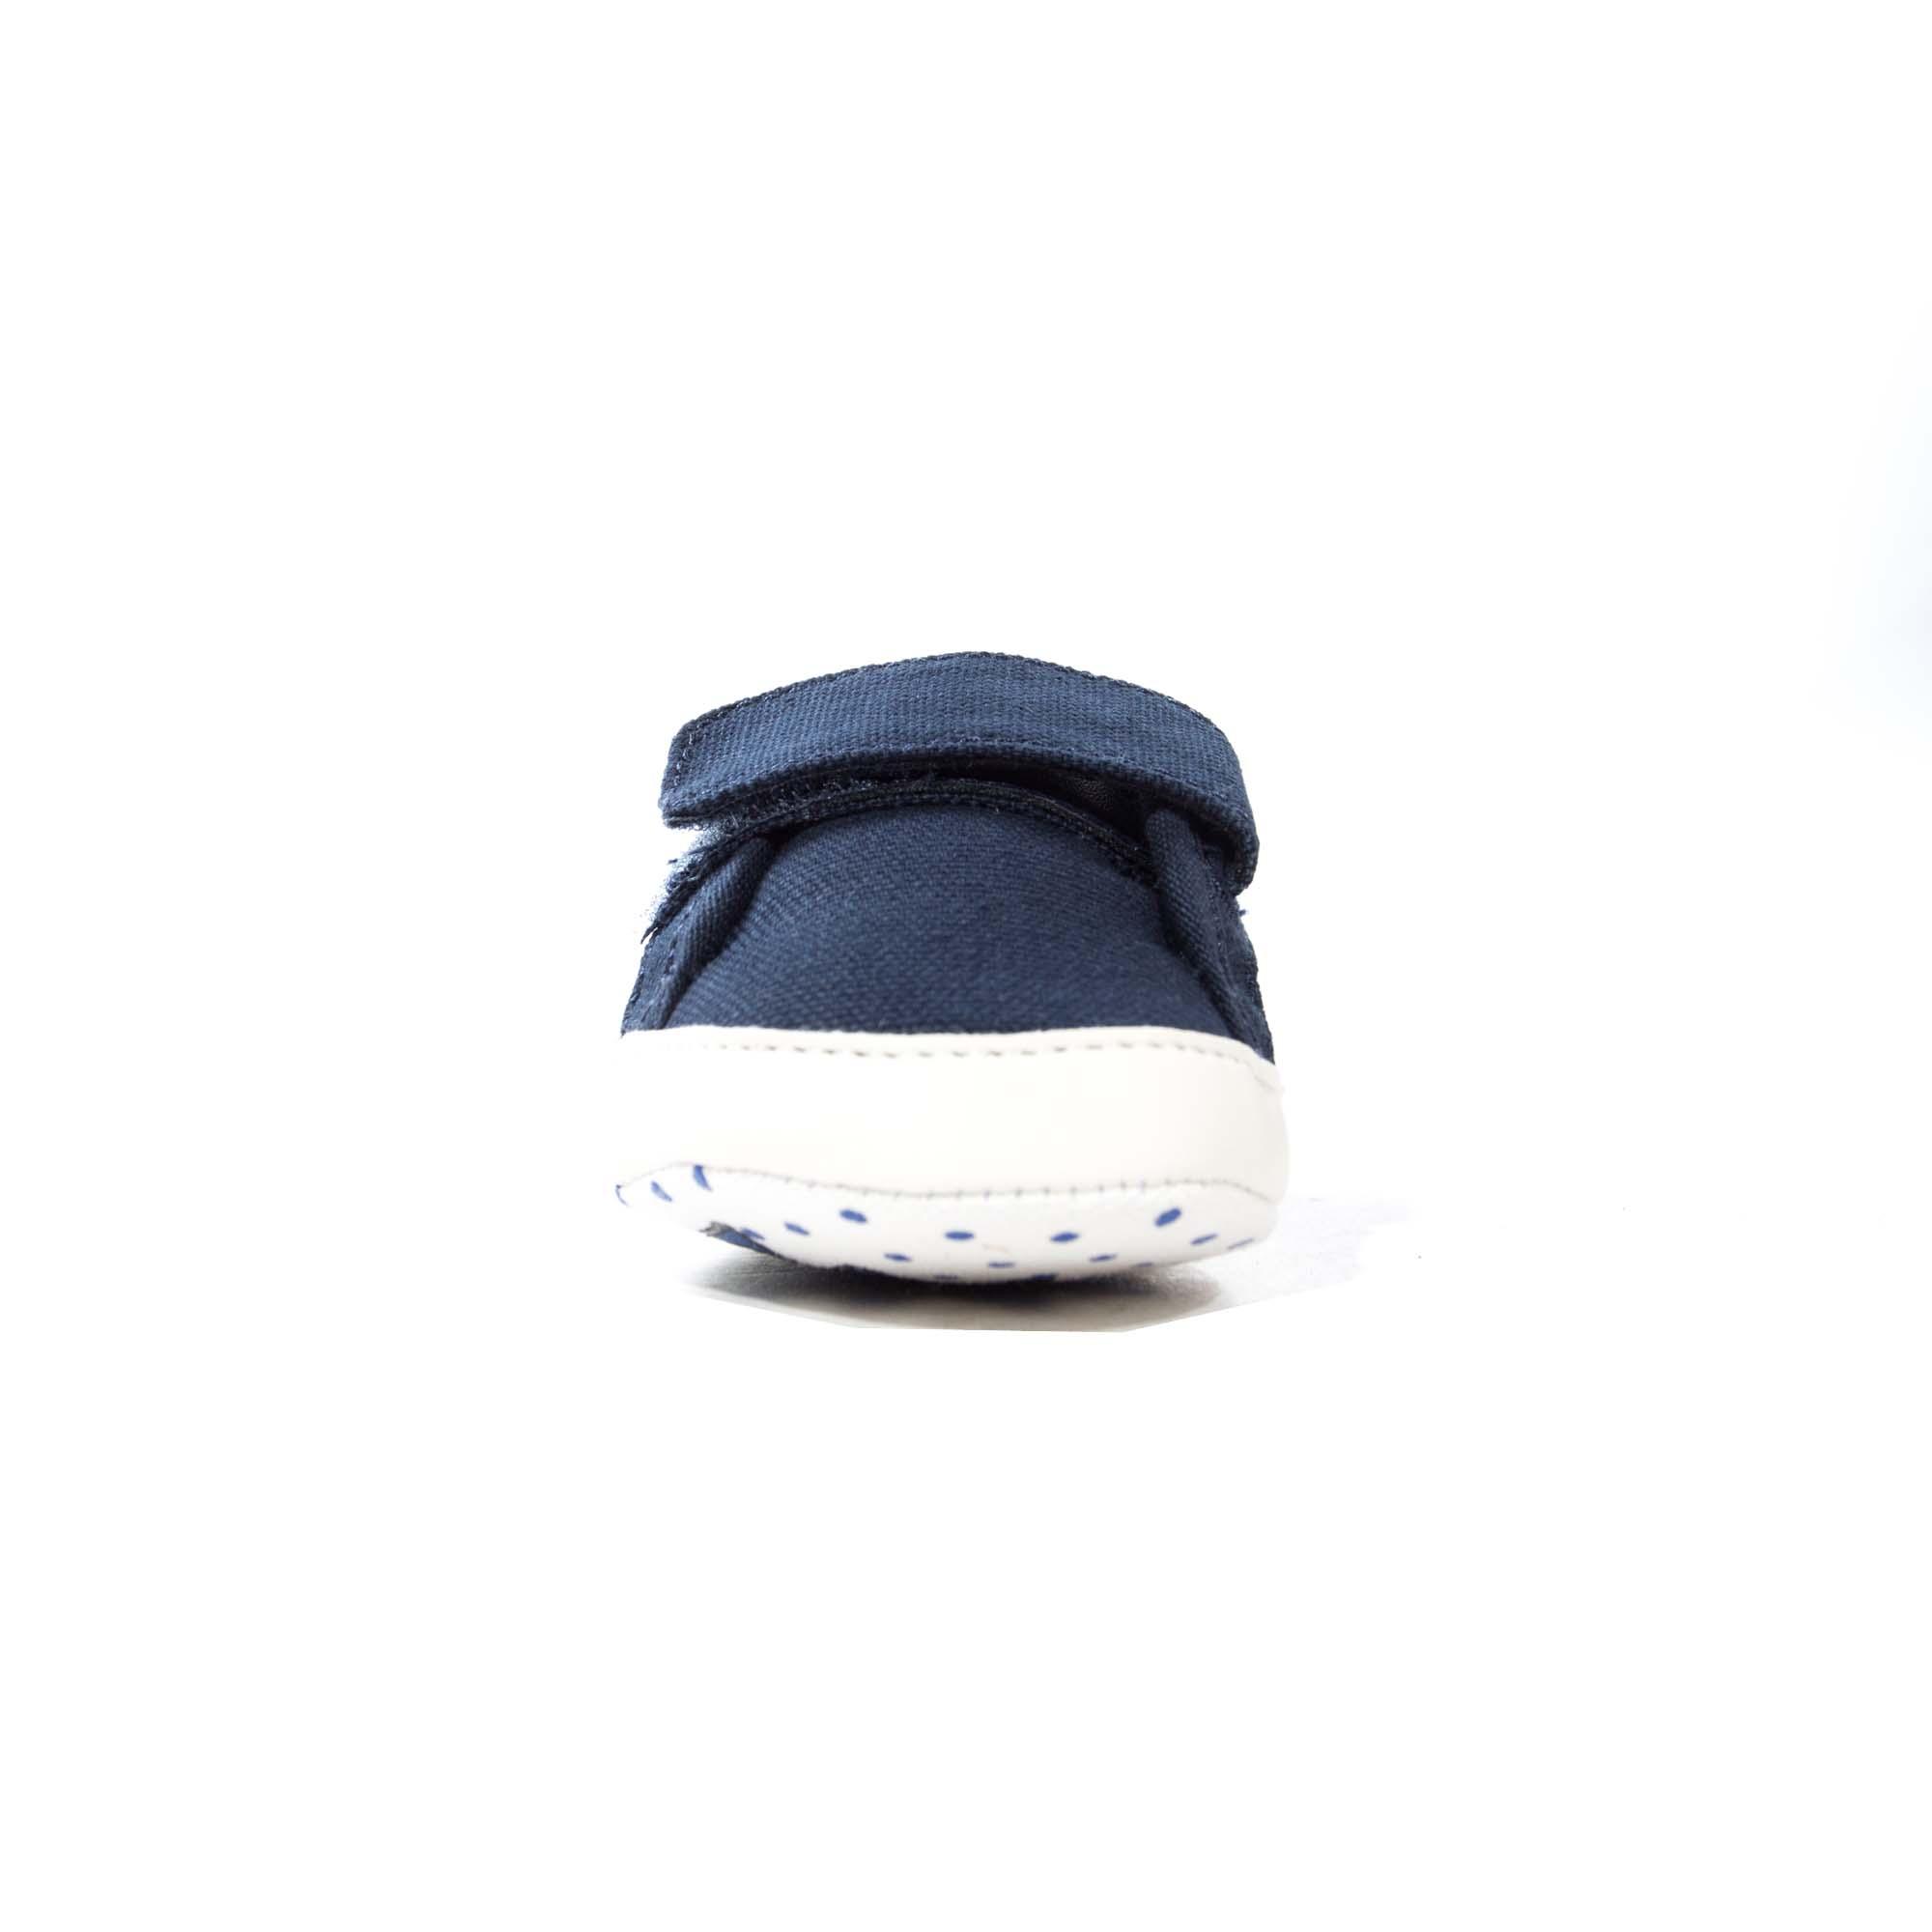 Kids Canvas Sneaker Slip-on Baby Boys